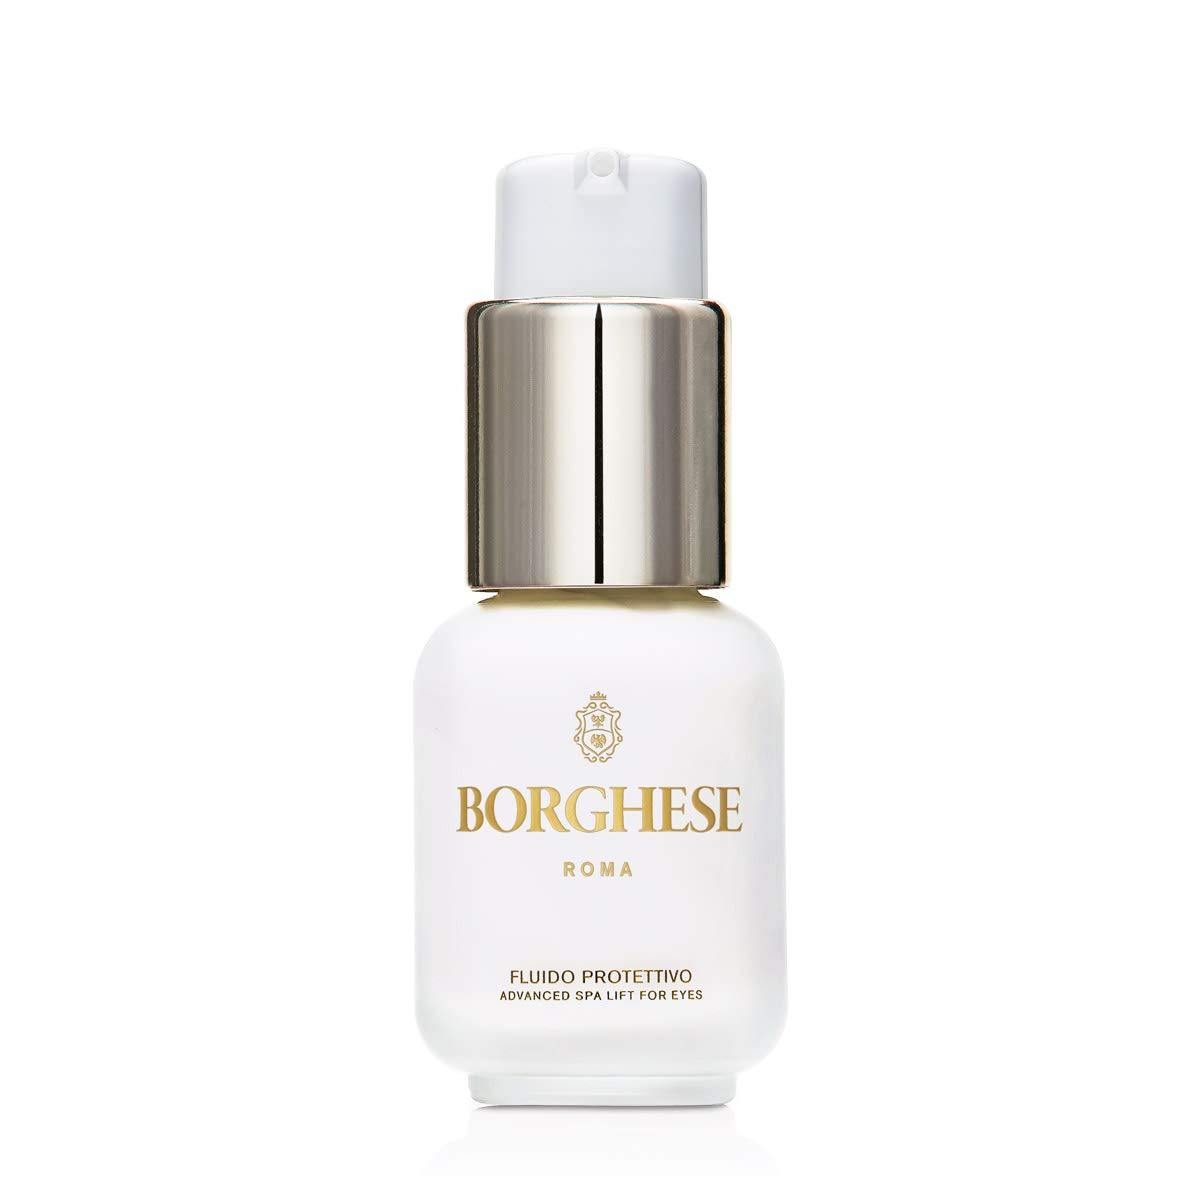 Borghese Fluido Protettivo Advanced Eye Lift Creme, Eye Cream for Dark Circles and Puffiness, 1 fl. oz.